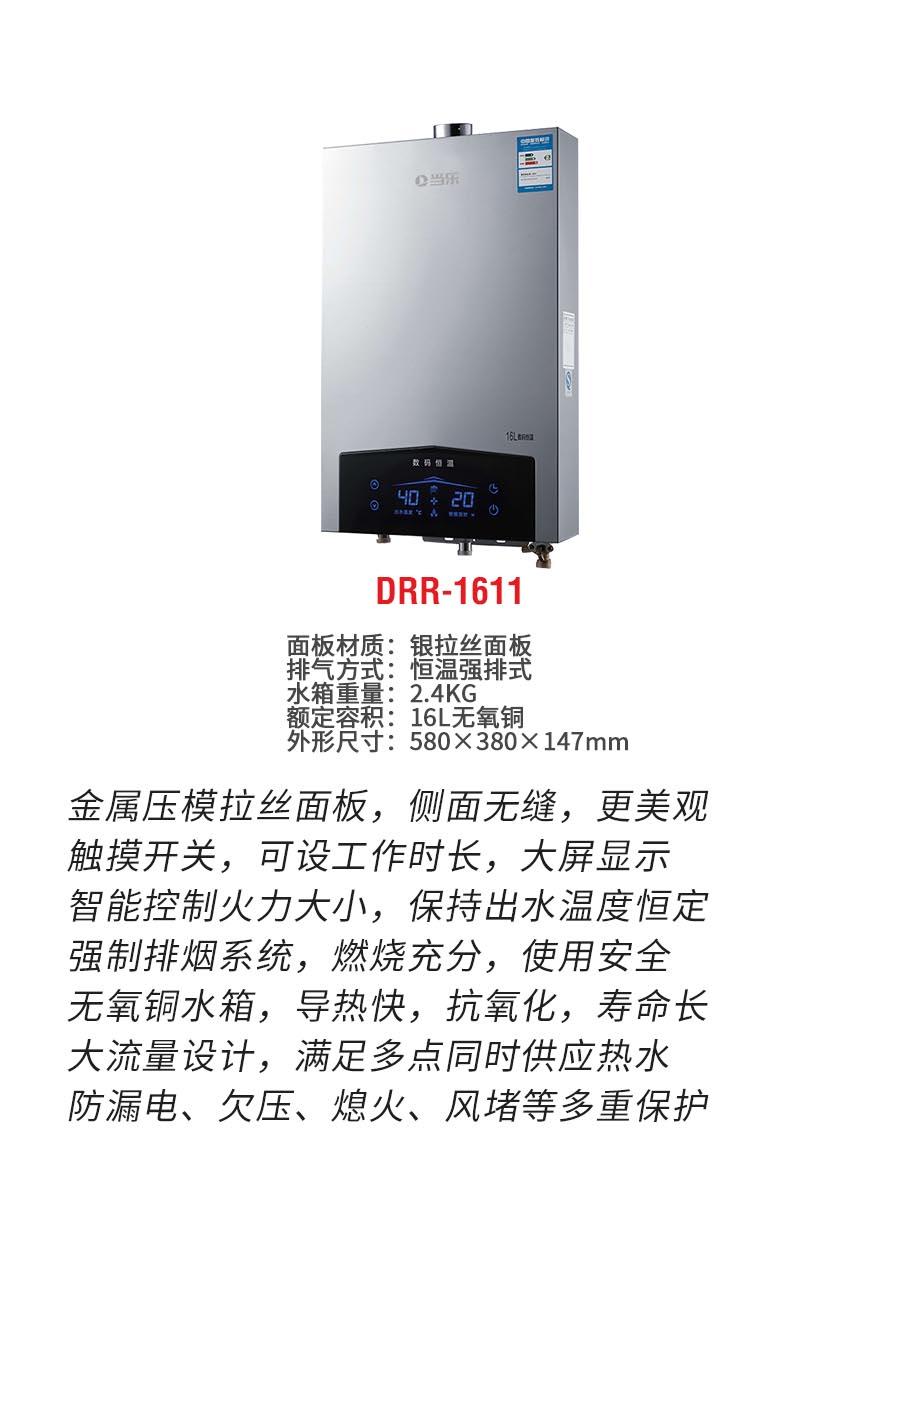 DRR-1611b.jpg